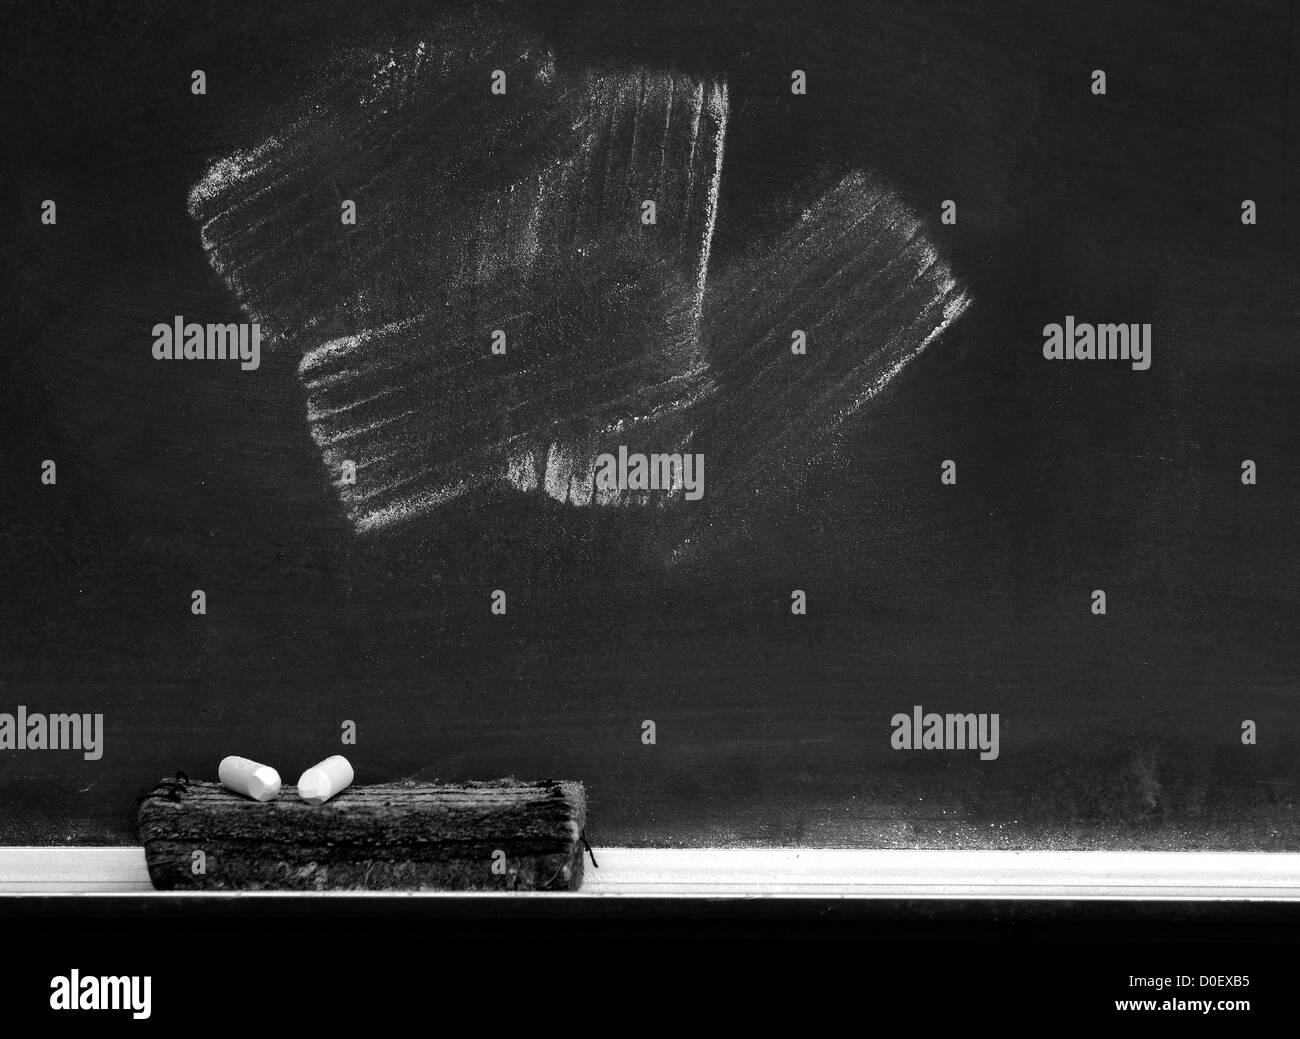 Chalkboard with chalk eraser marks in white chalk - Stock Image